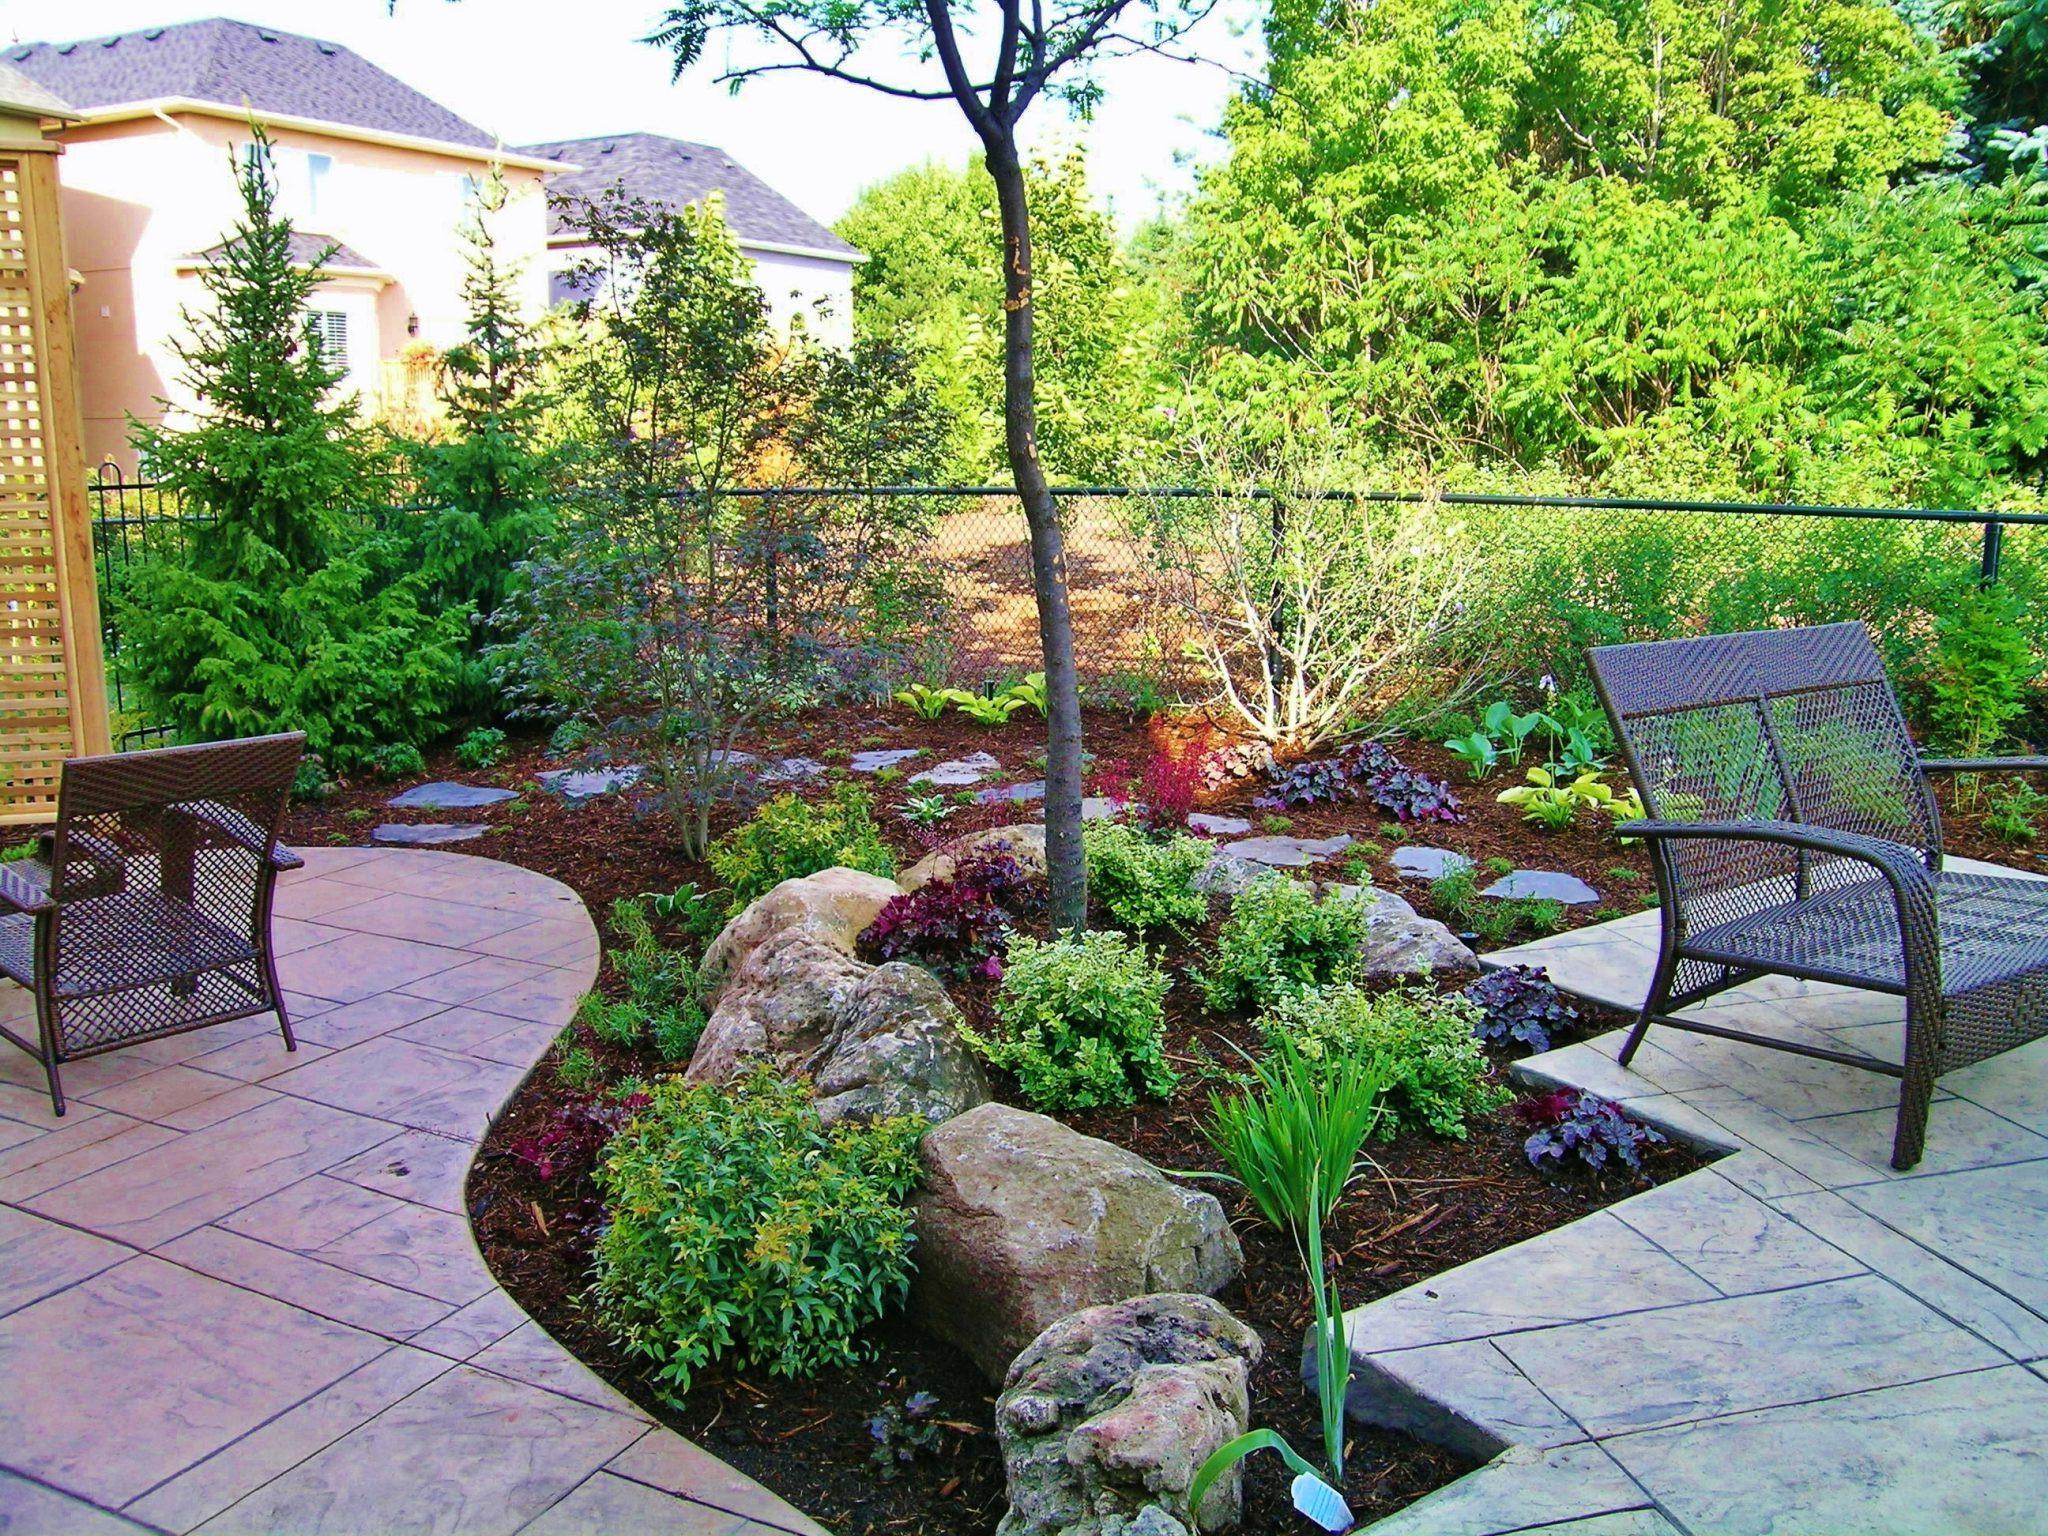 Outdoor Landscaping Ideas  20 Landscape Designs for Backyard Dap fice